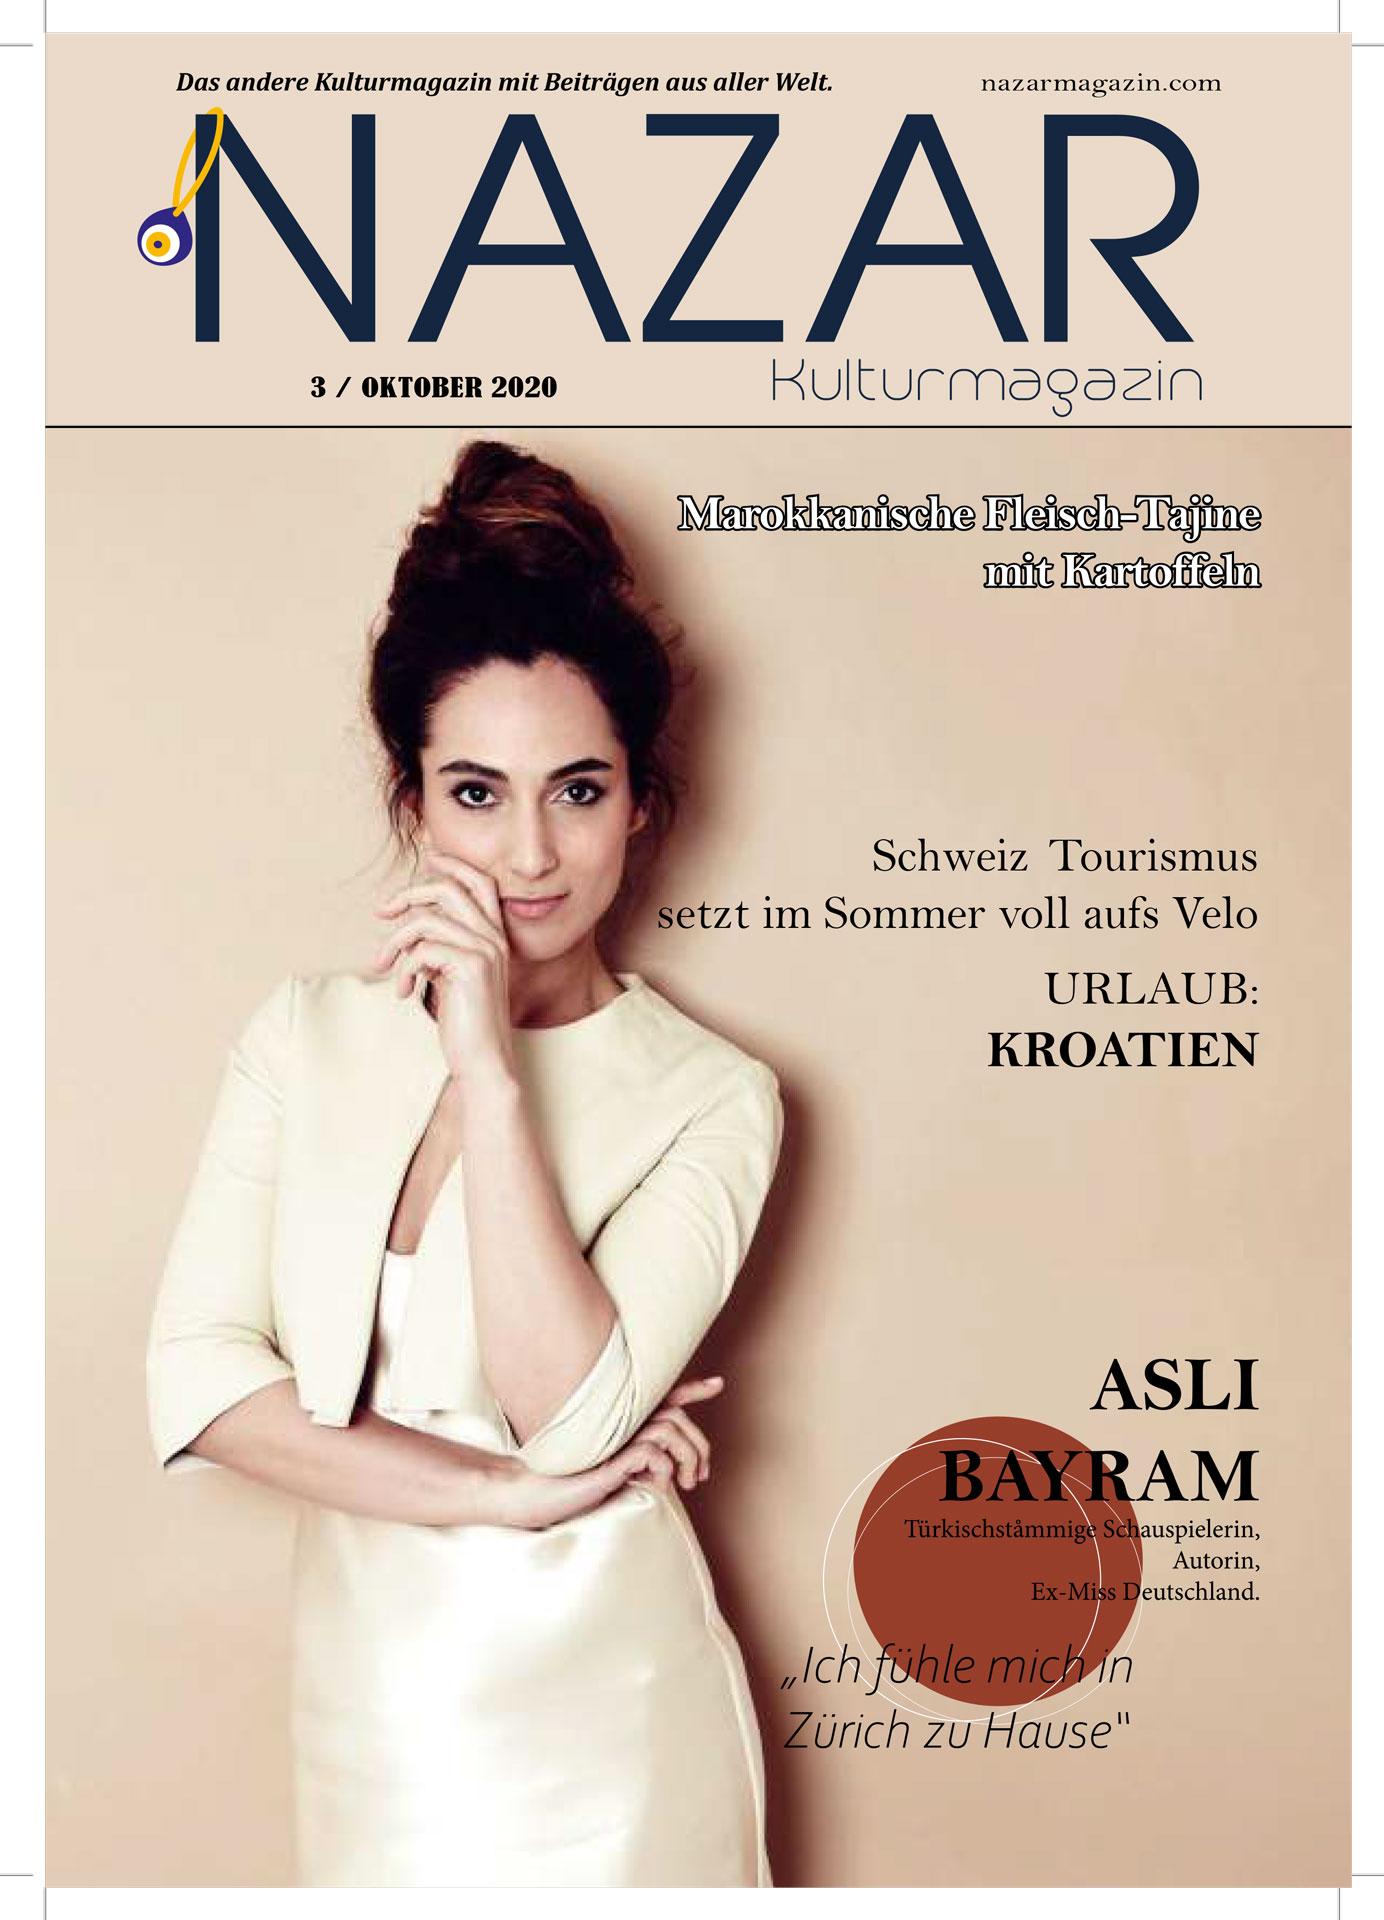 Nazar-Kultur-Magazin-Oktober-2020